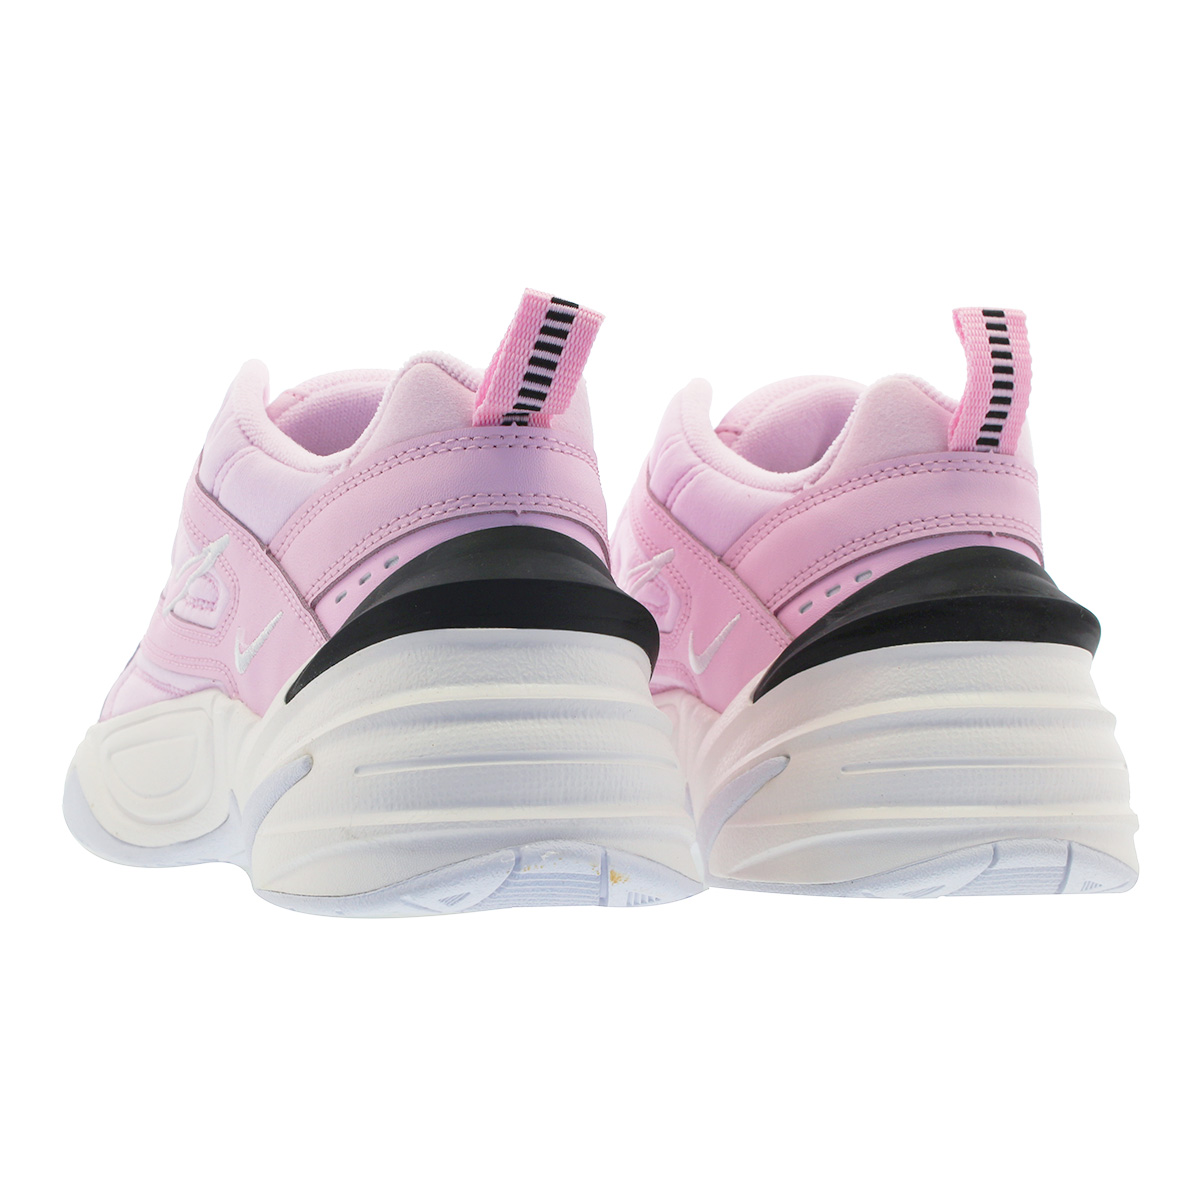 f7d1276a485 NIKE WMNS M2K TEKNO Nike women M2K techno PINK FOAM BLACK PHANTOM WHITE  ao3108-600